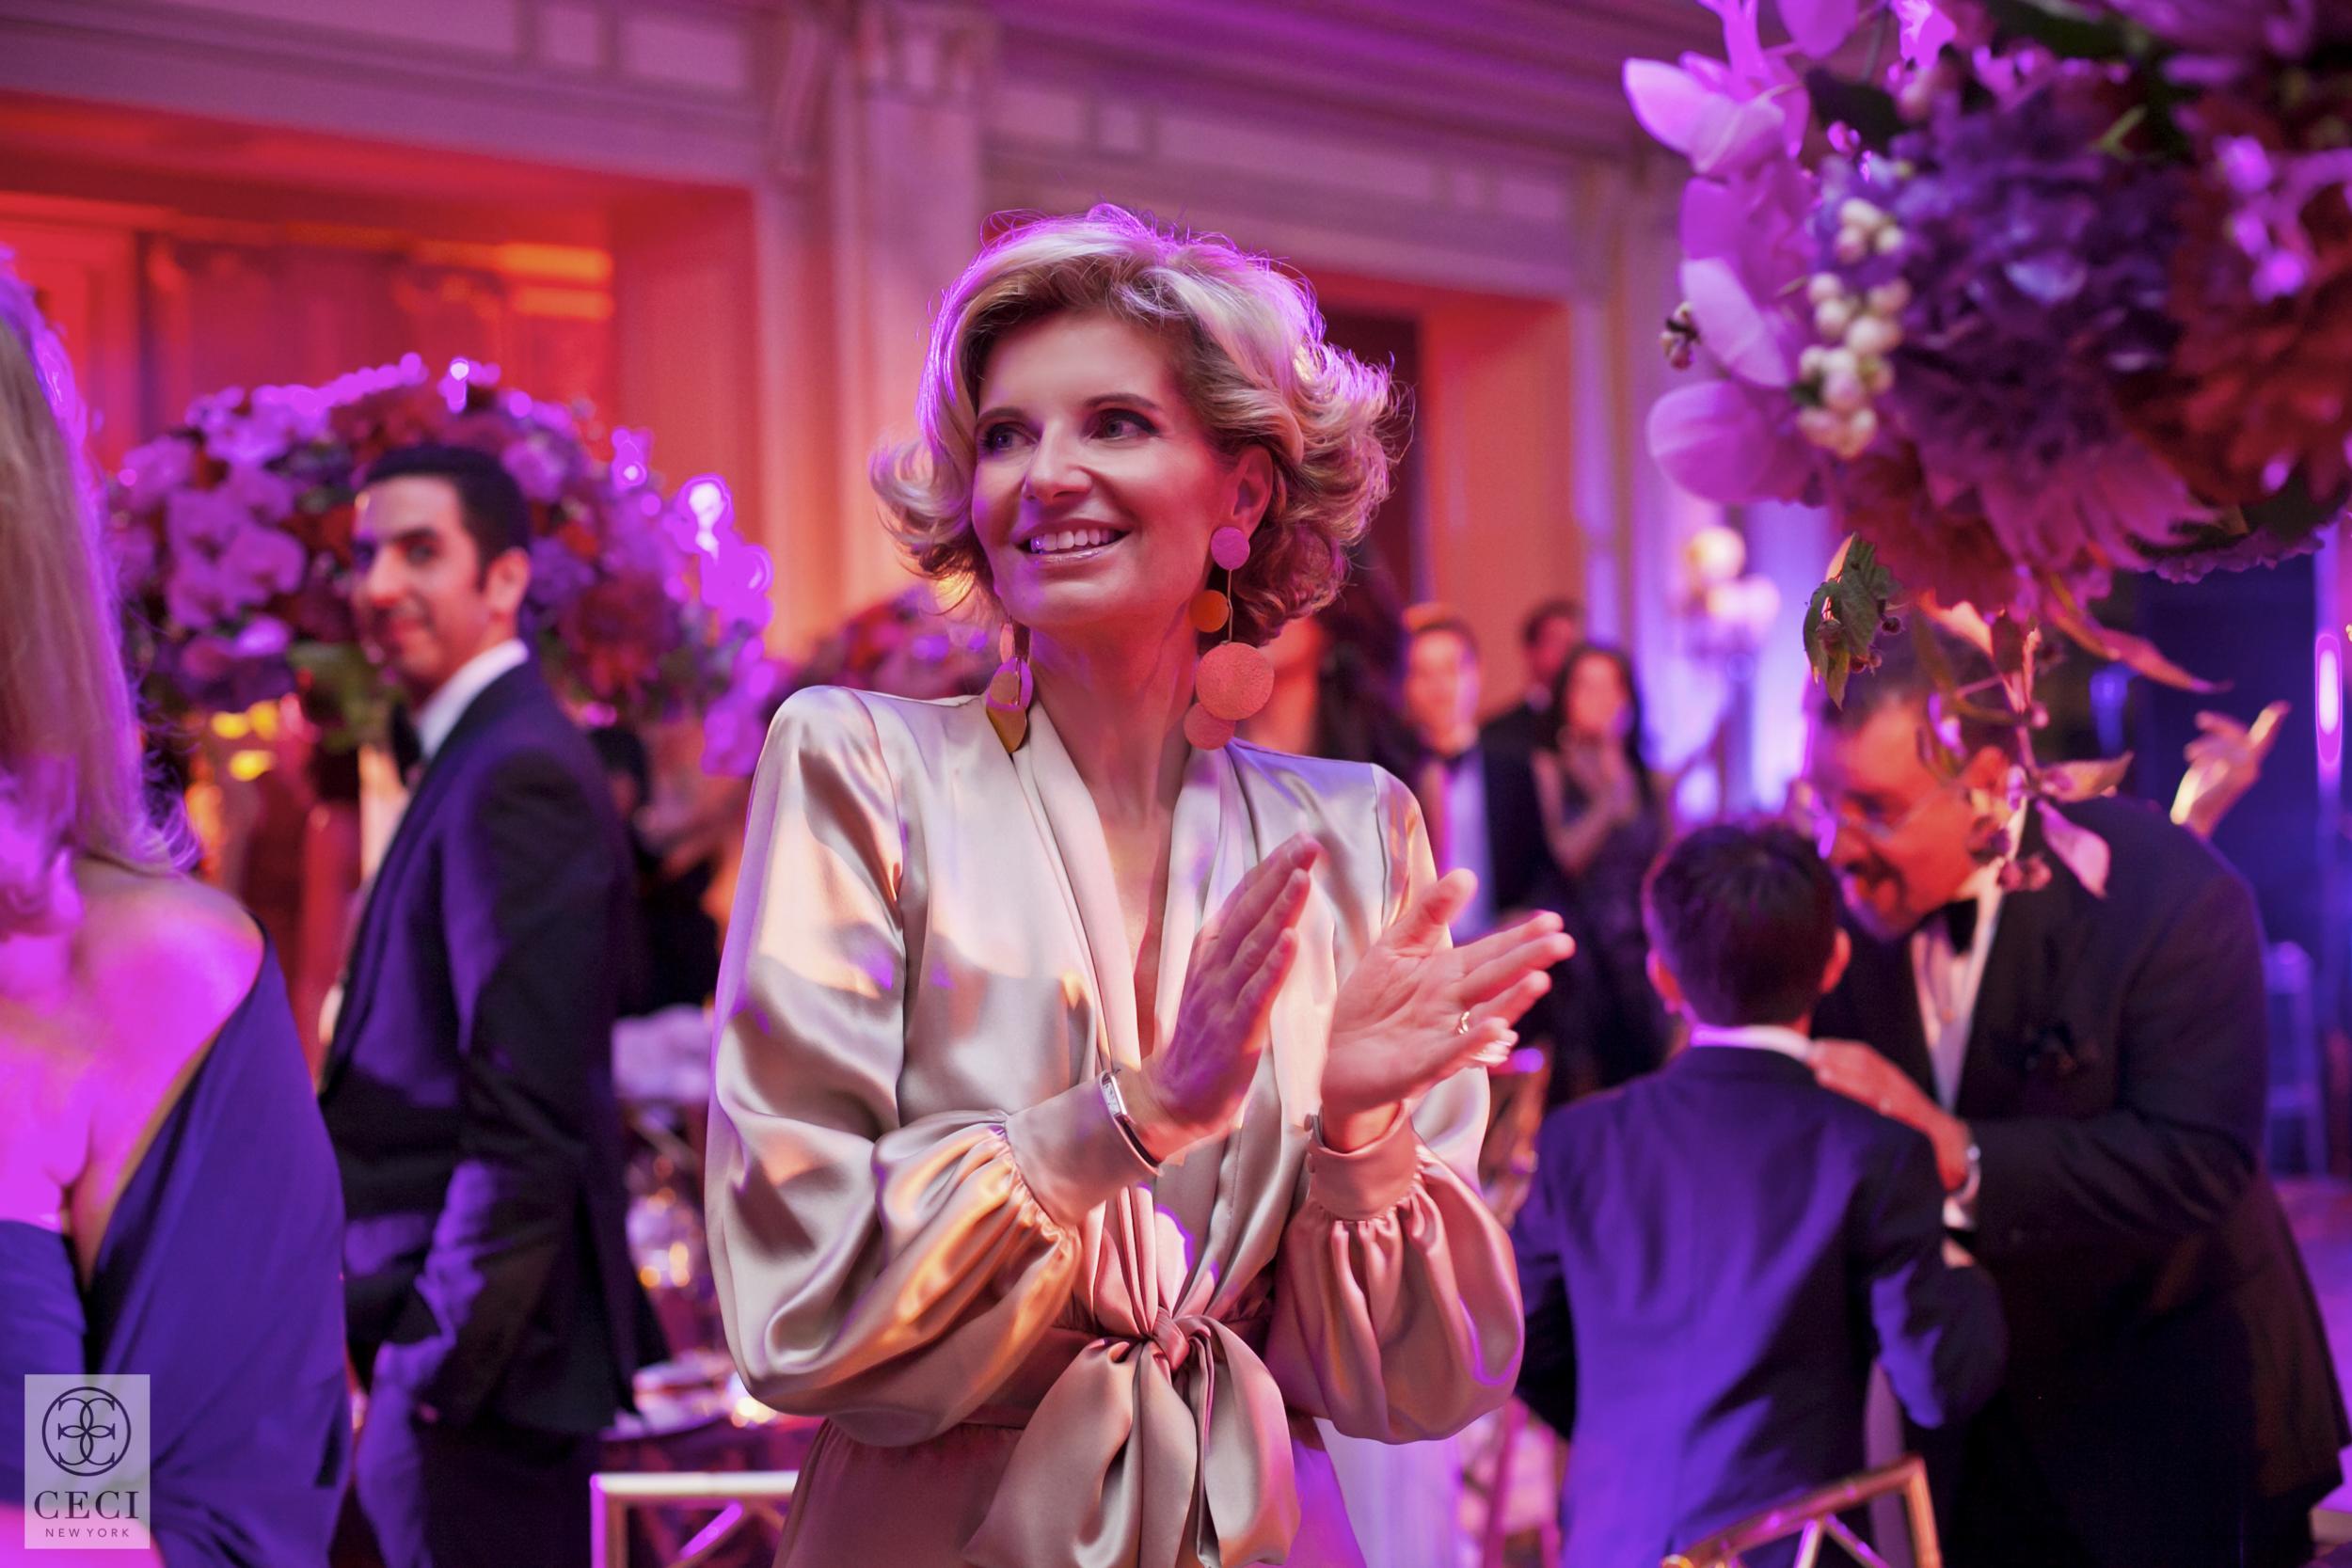 ceci_new_york_lucas_somoza_purple_regal_wediding_birthday_commitment_ceremony_gold-24.jpg